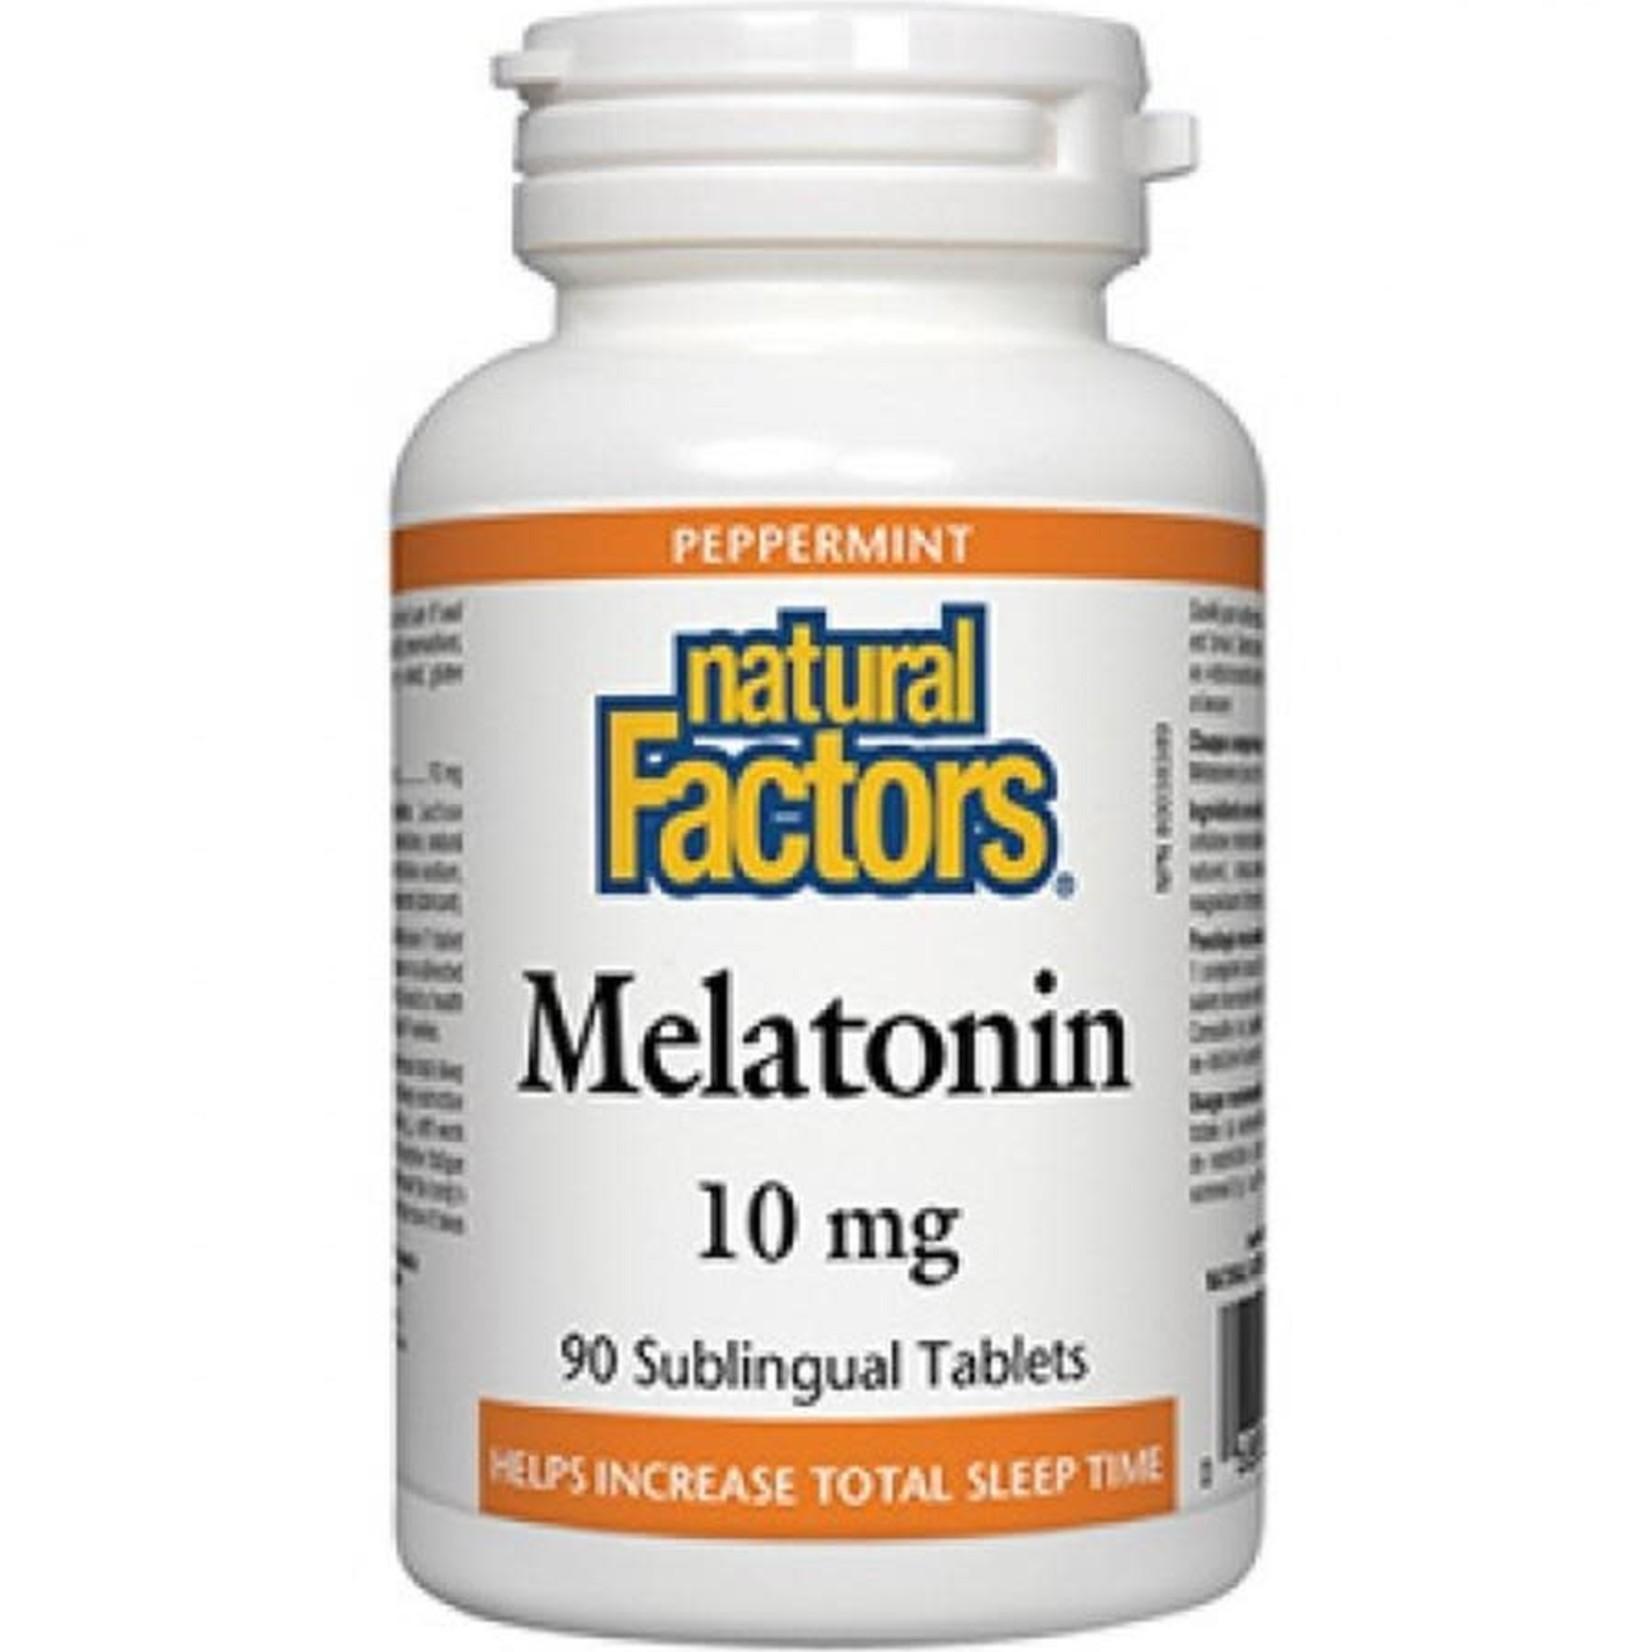 Natural Factors Natural Factors Melatonin 10mg 90 sublingual tabs